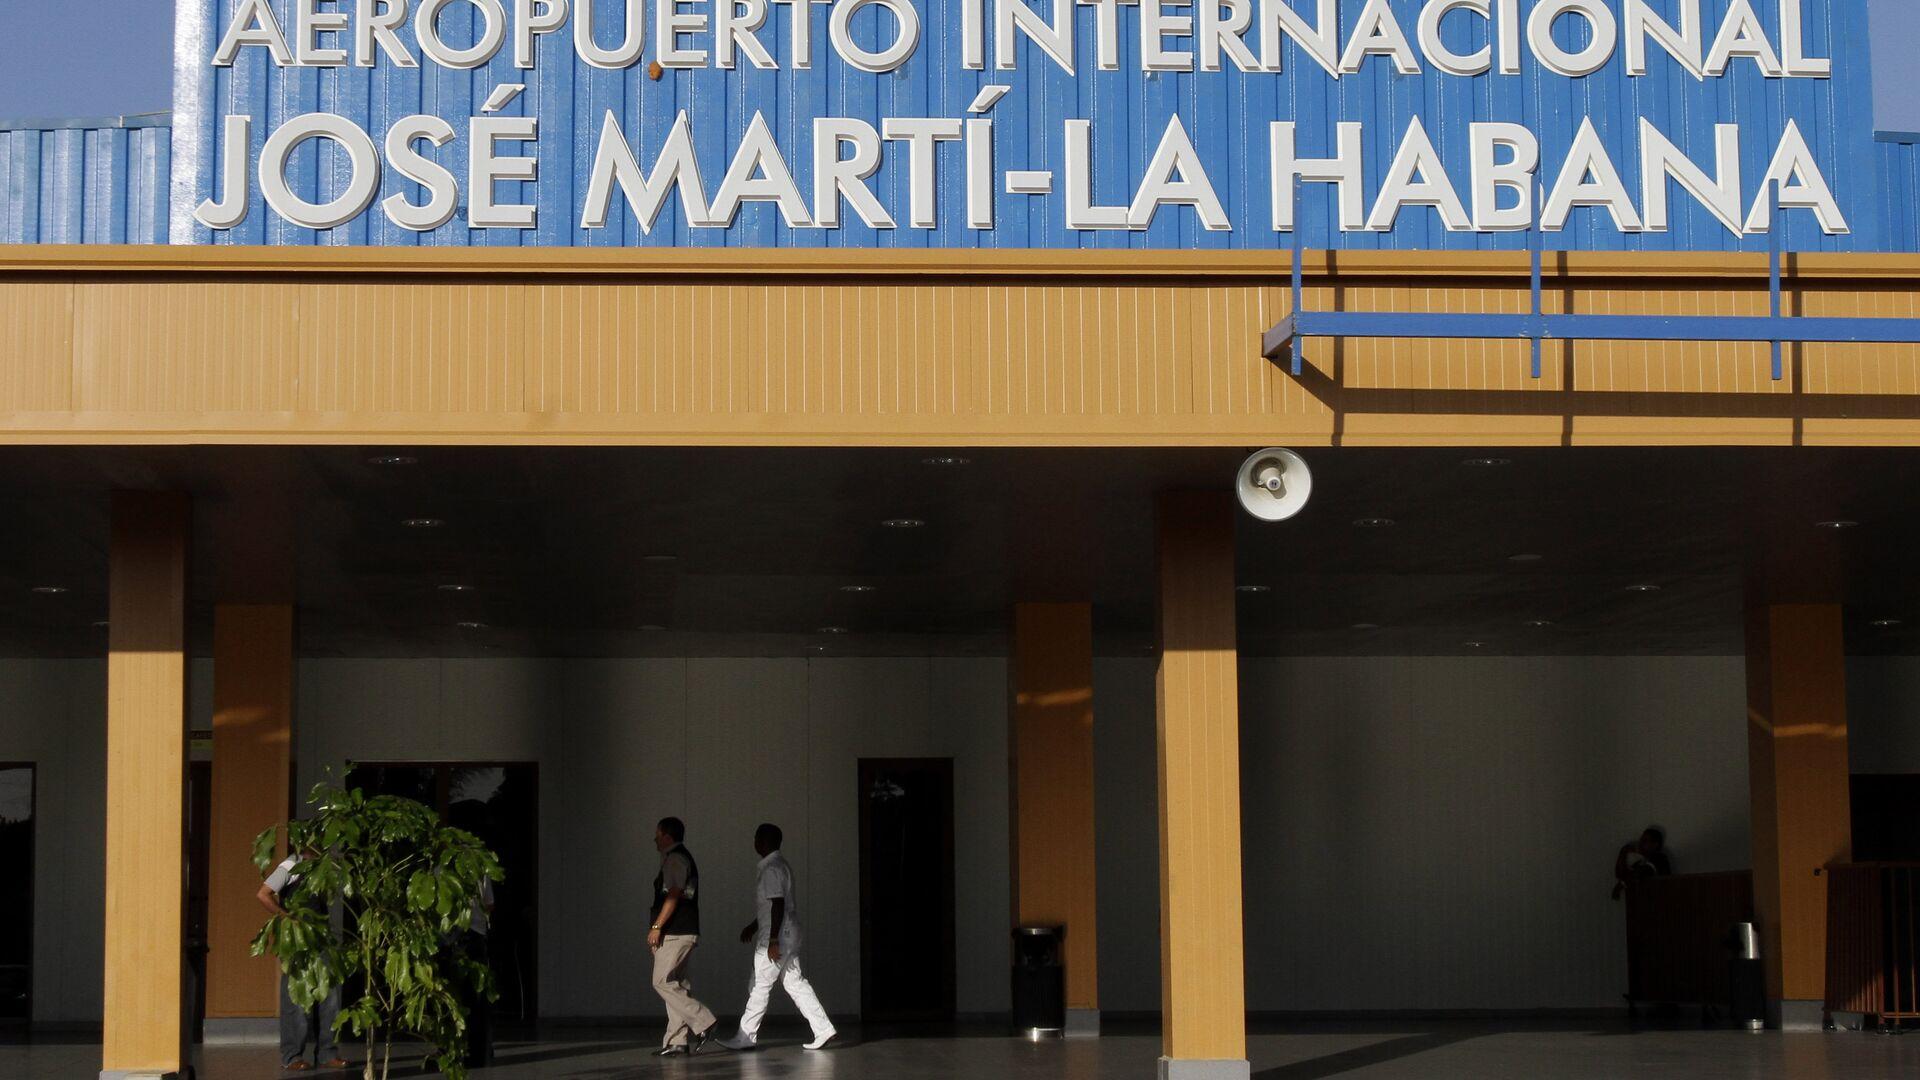 Aeropuerto Internacional José Martí de La Habana - Sputnik Mundo, 1920, 14.07.2021